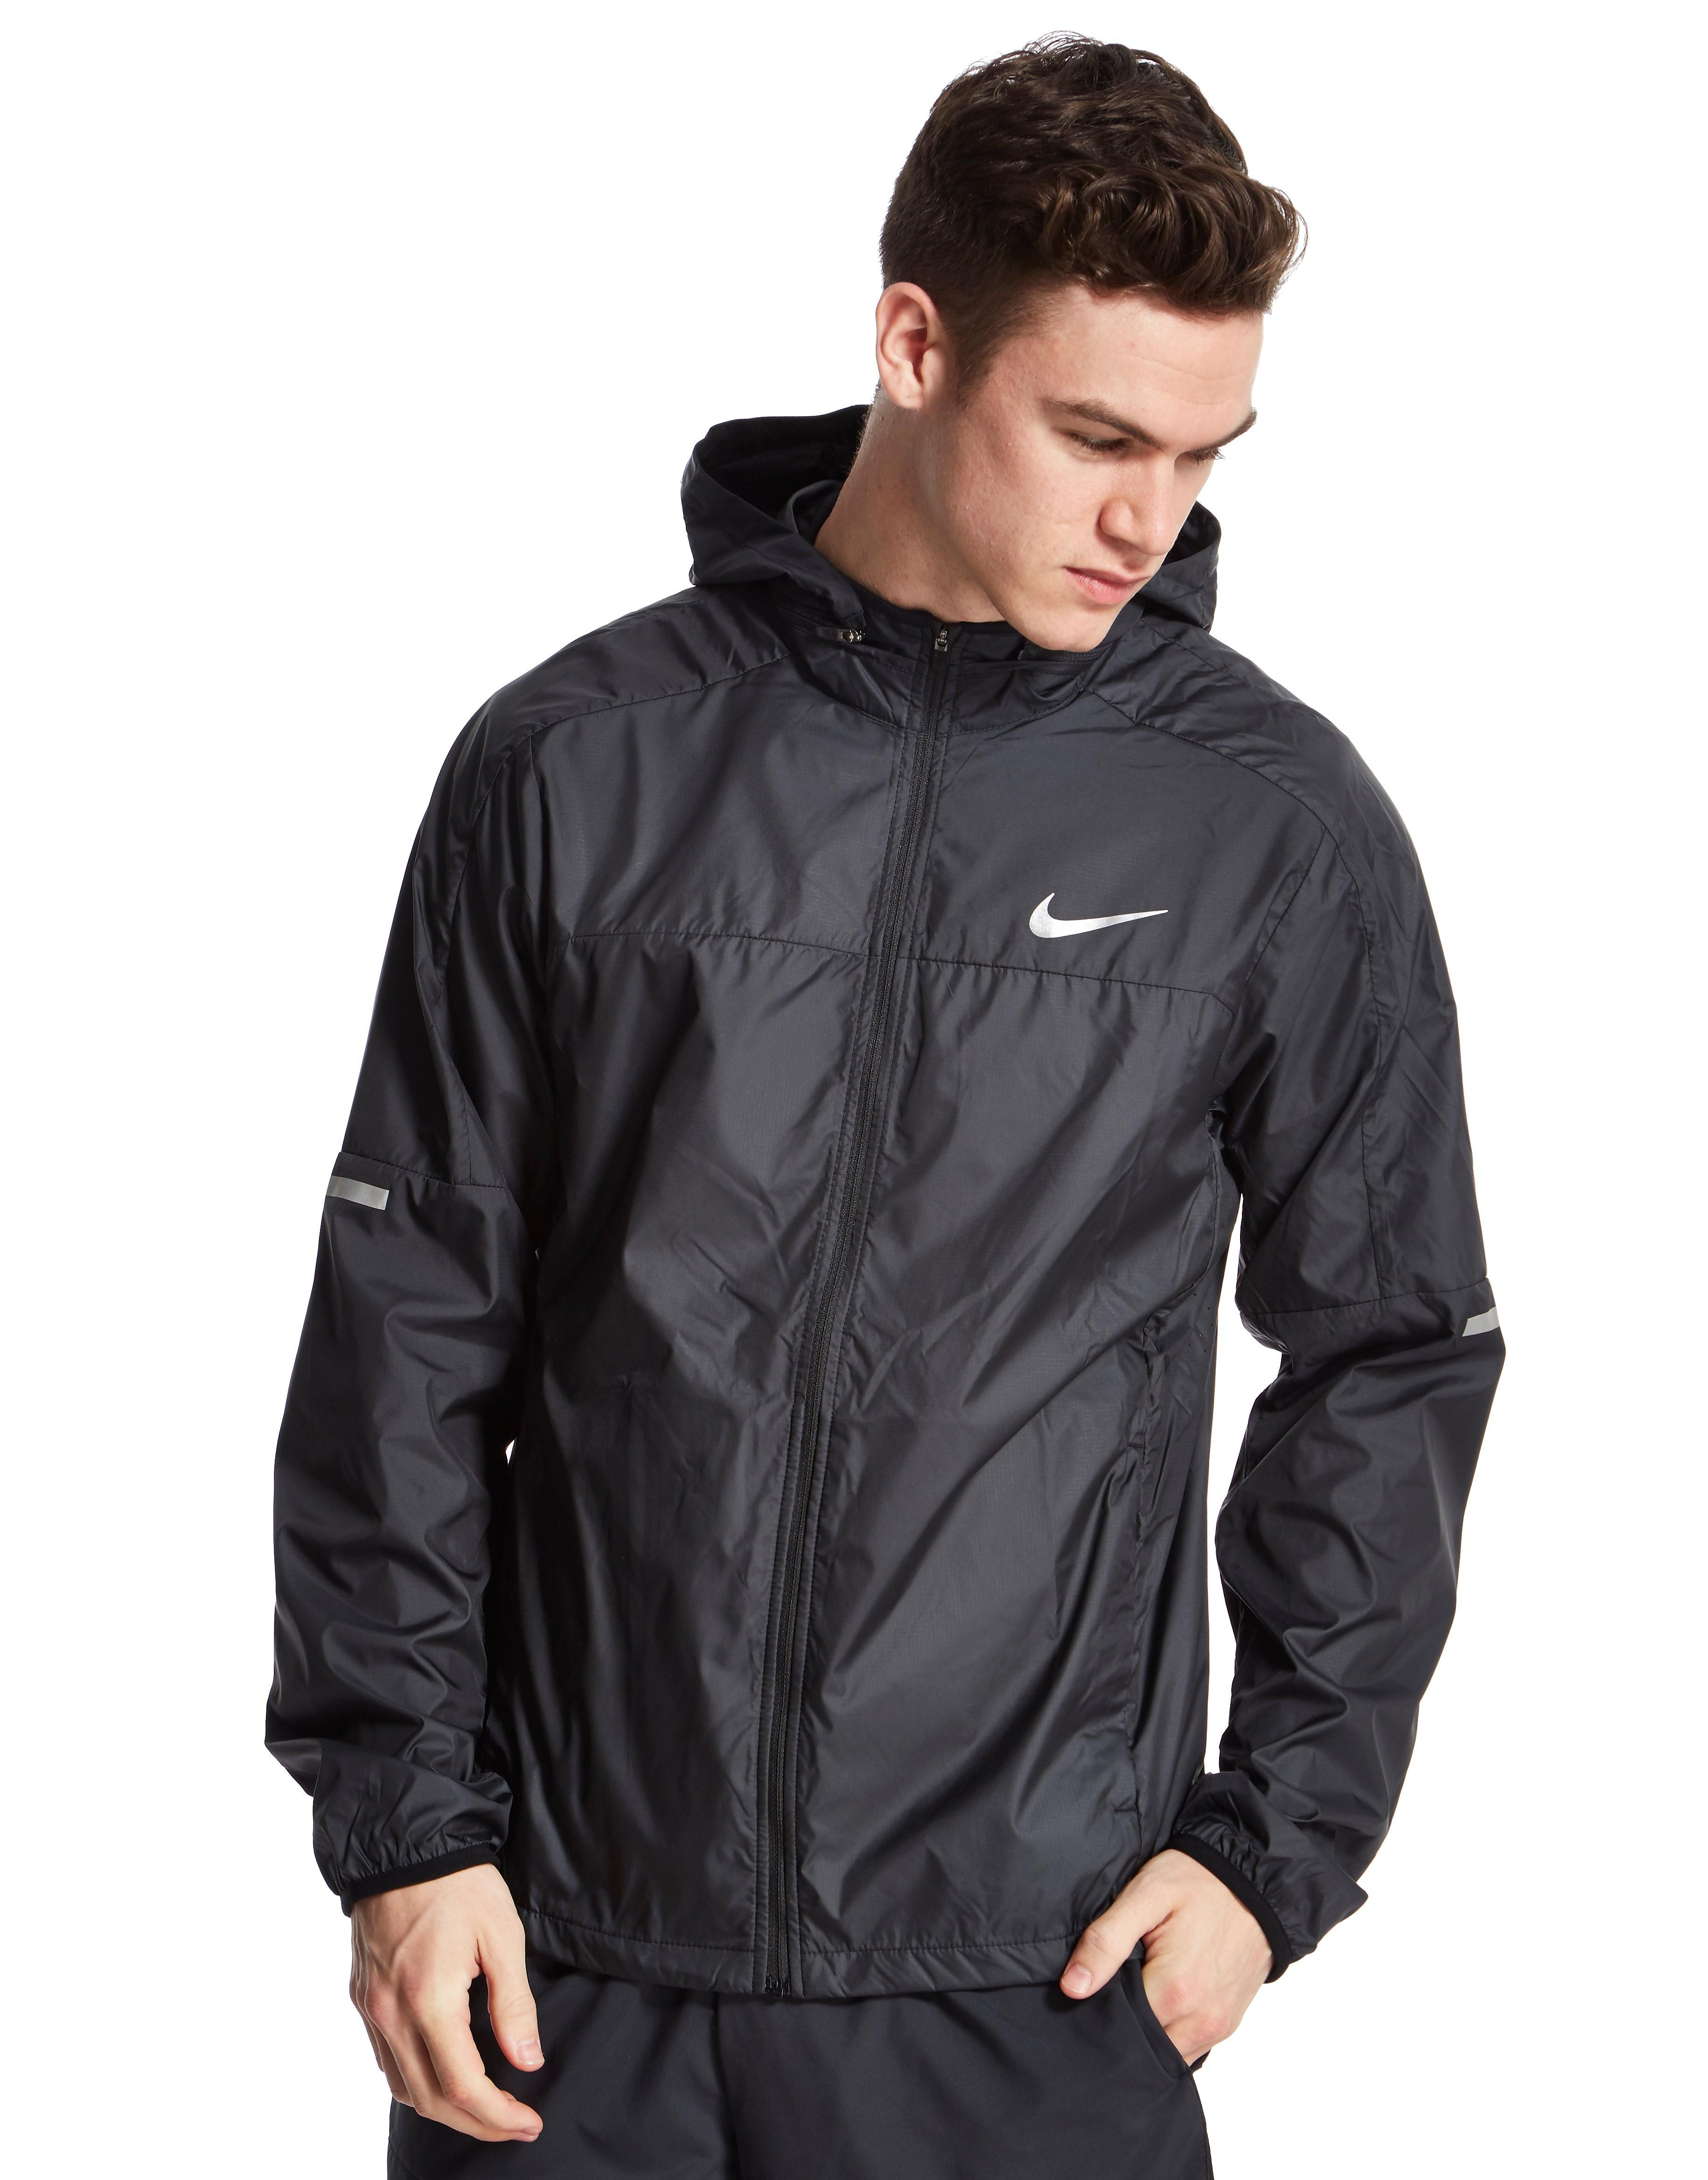 nike air max half zip chevron jacket black mens black. Black Bedroom Furniture Sets. Home Design Ideas